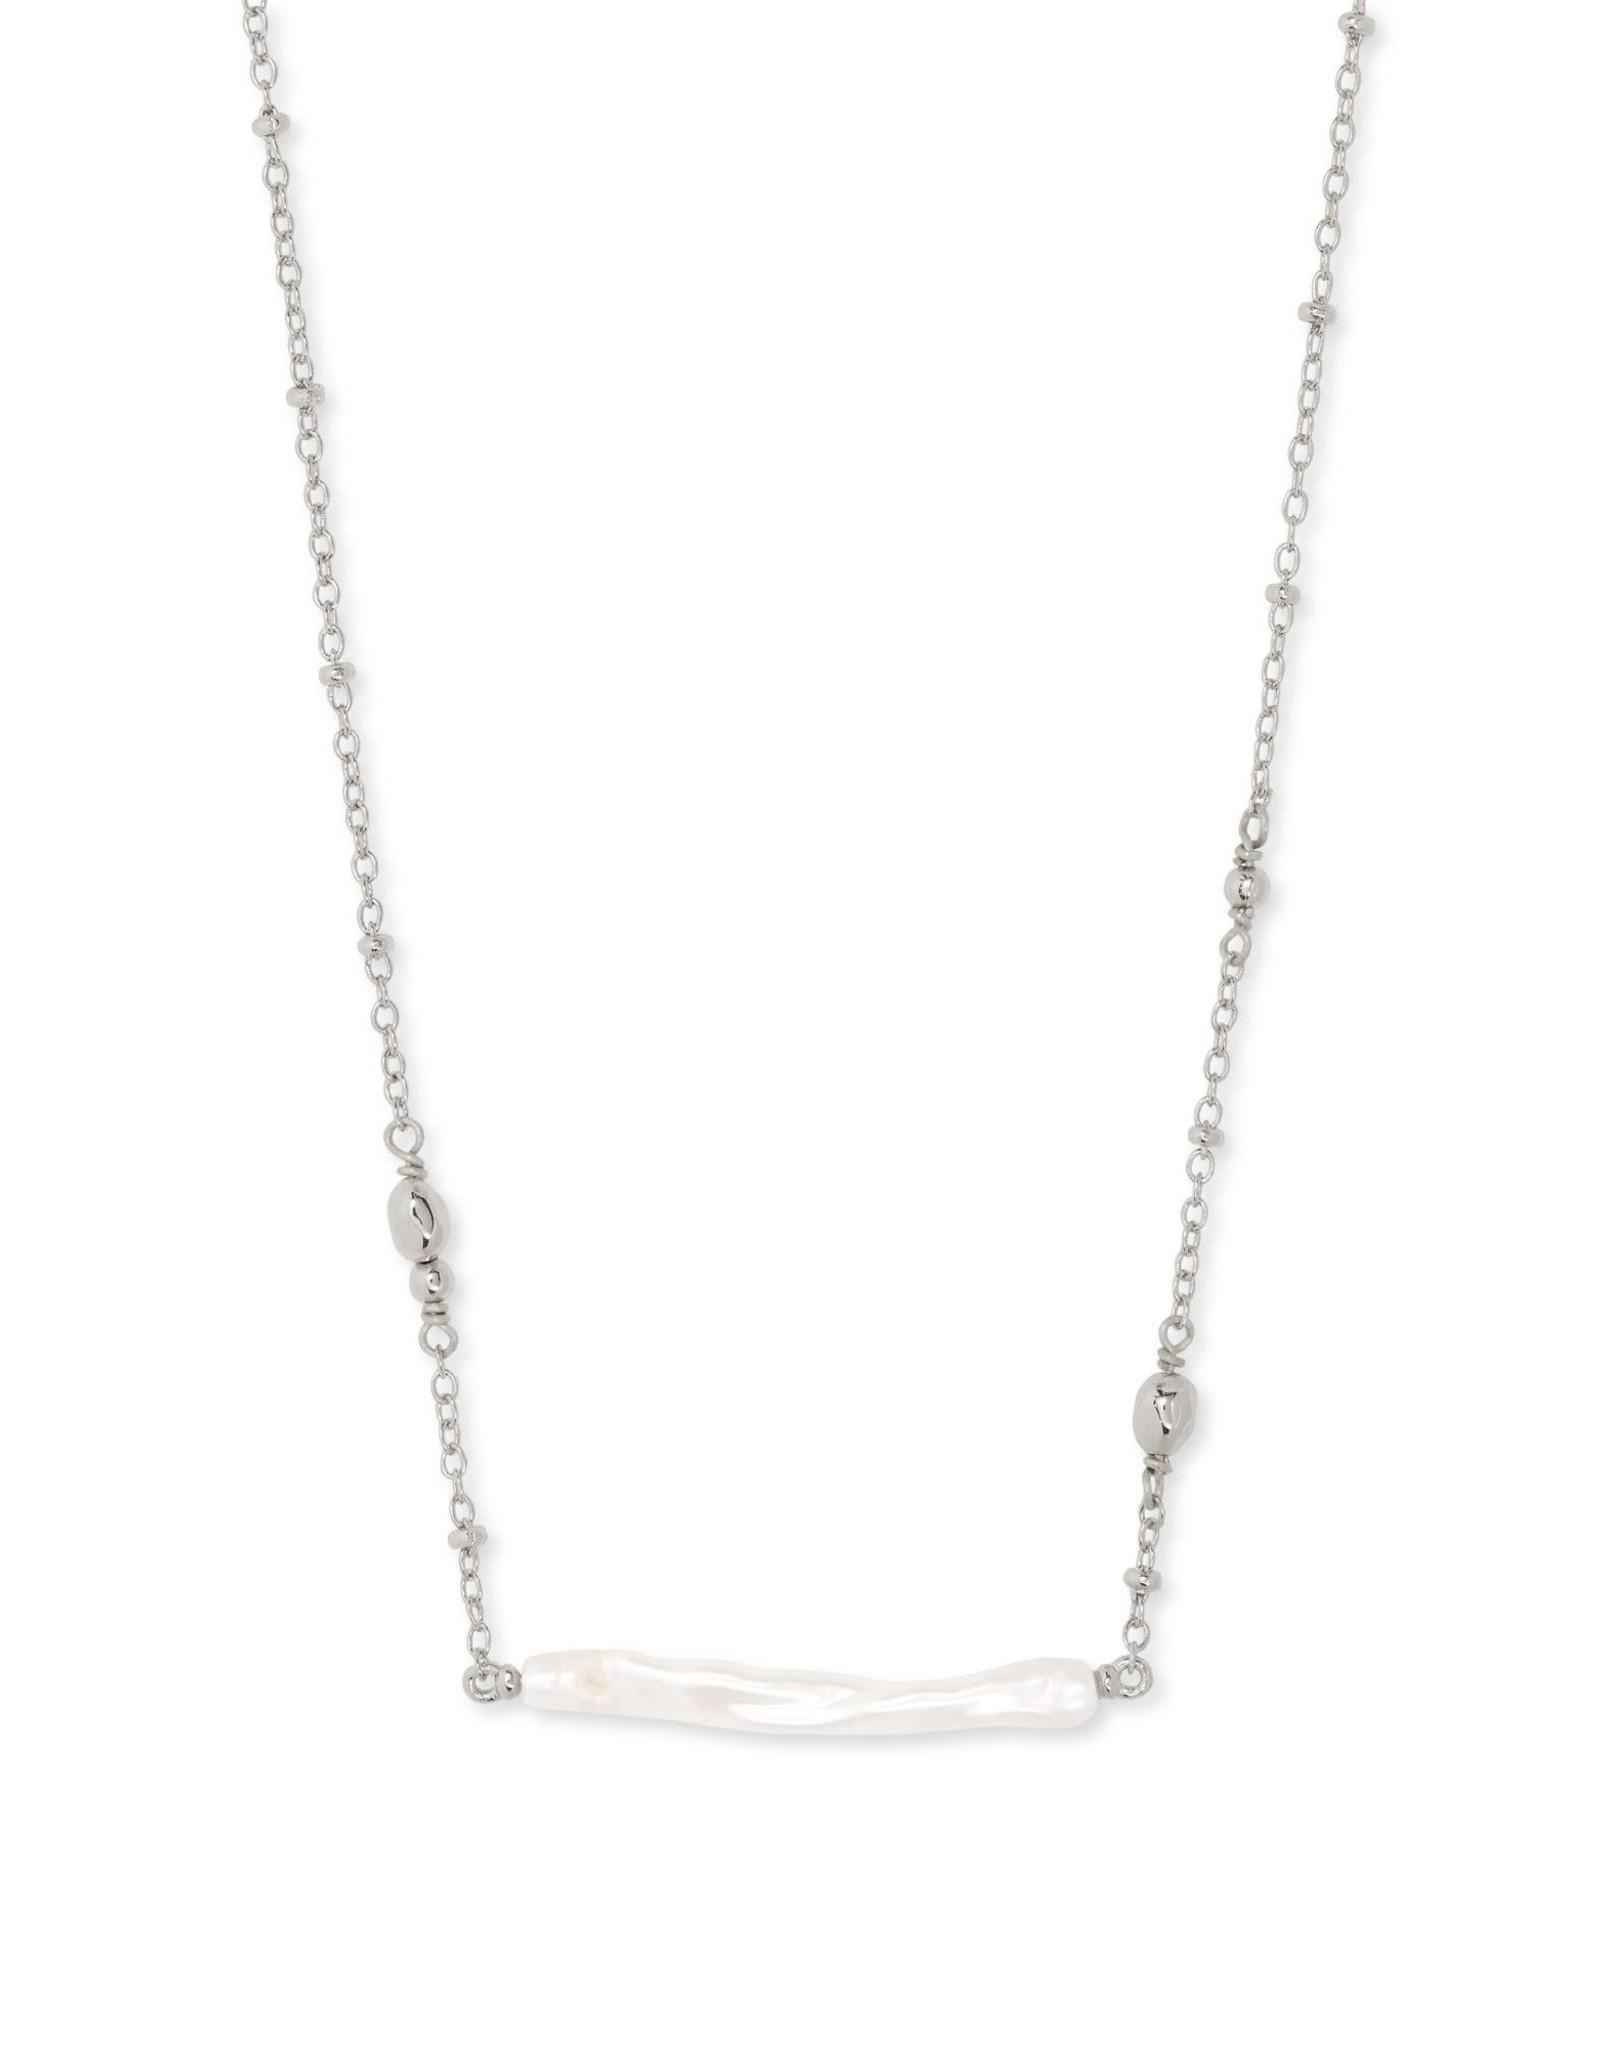 Kendra Scott Eileen Pendant Necklace - White Pearl/Rhodium